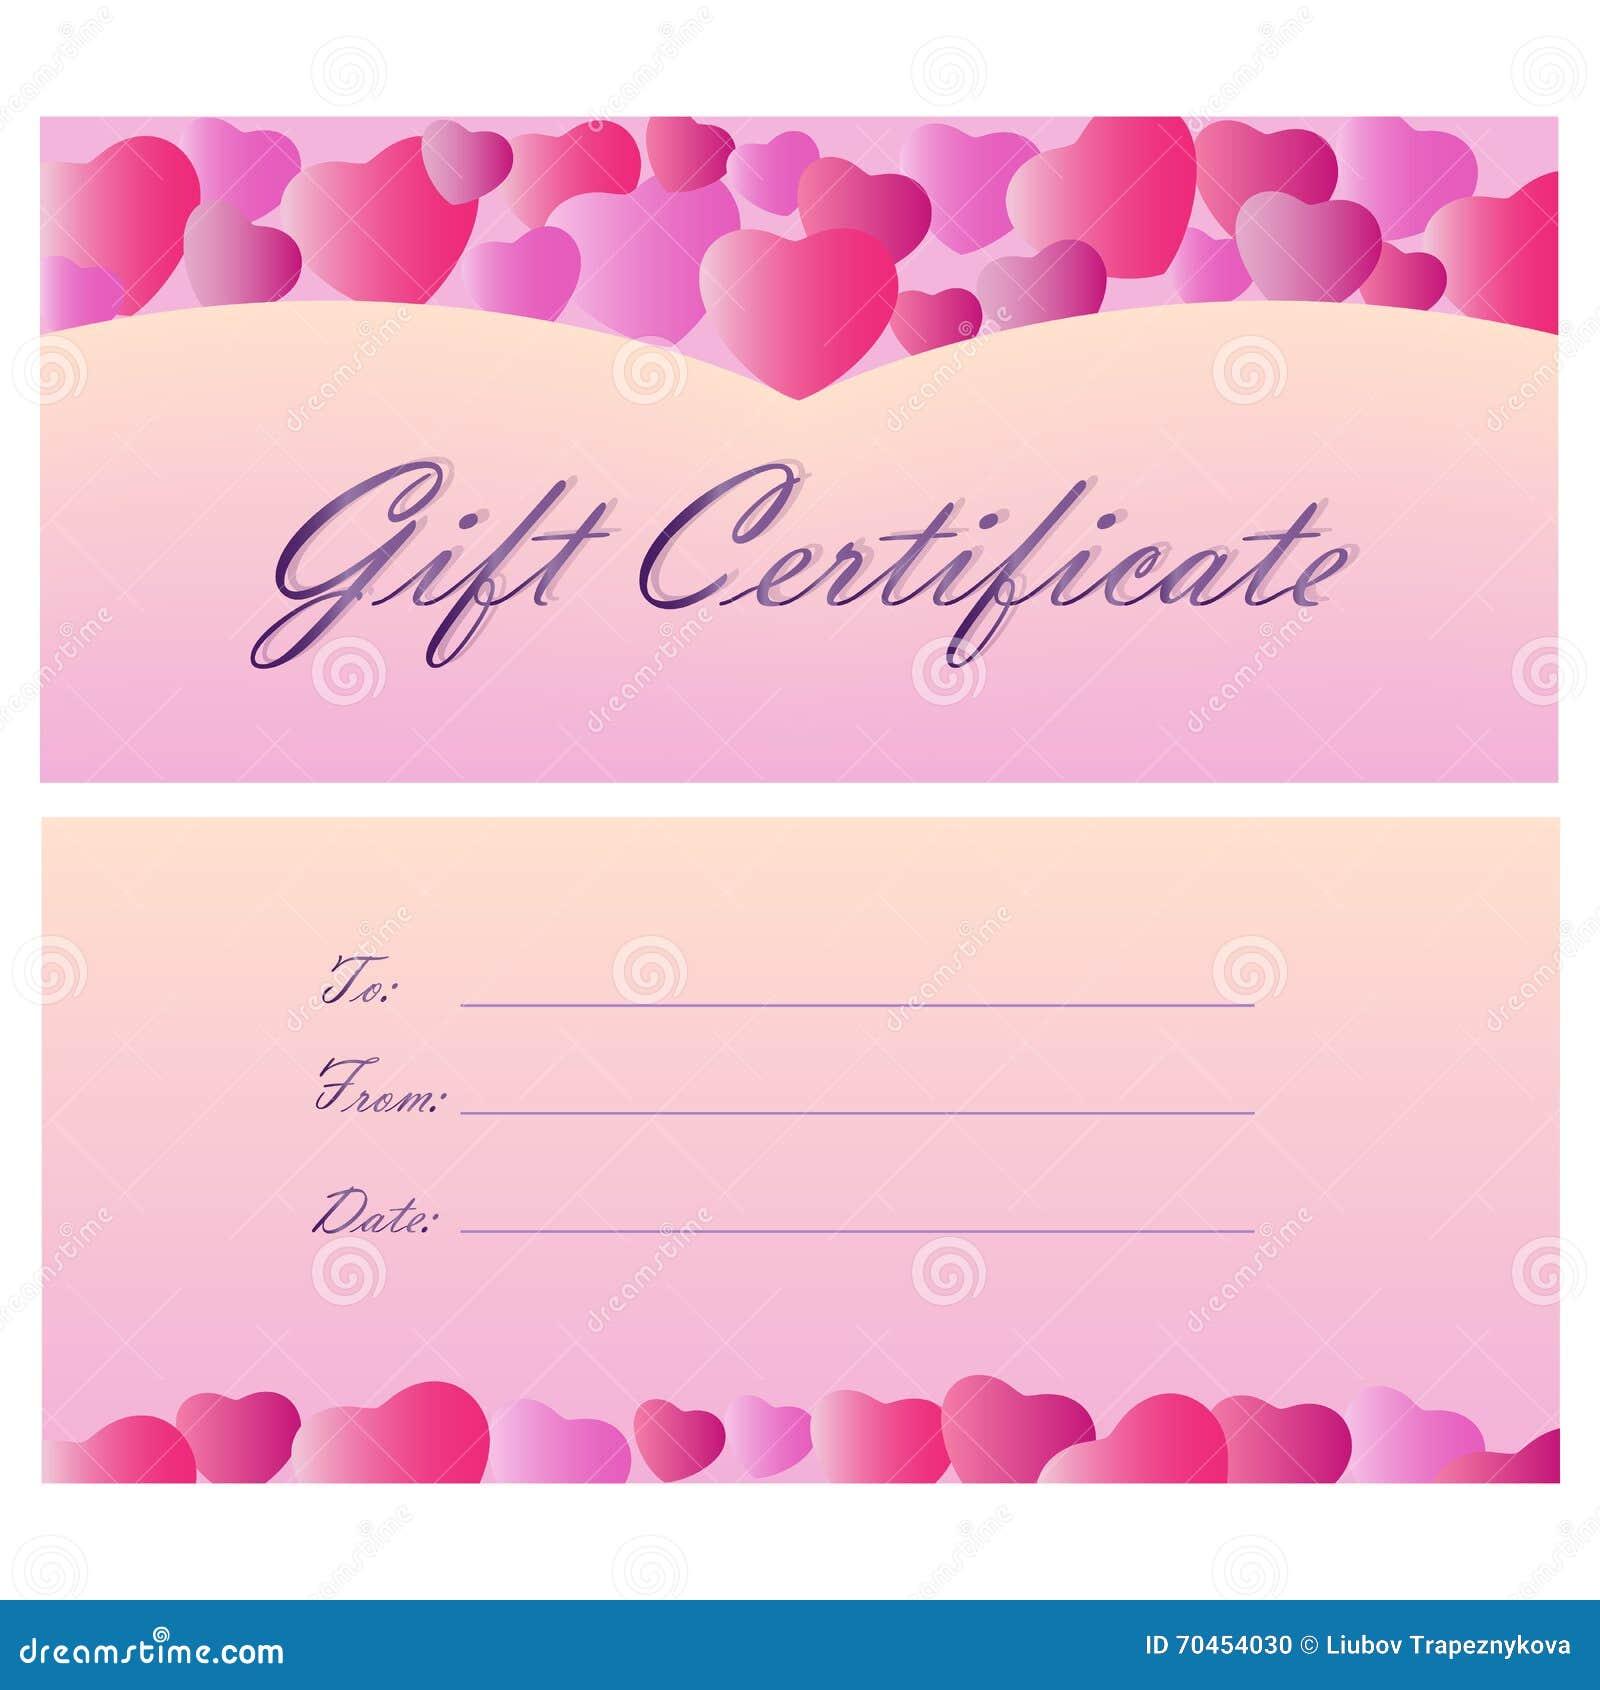 gift coupon template   datariouruguay